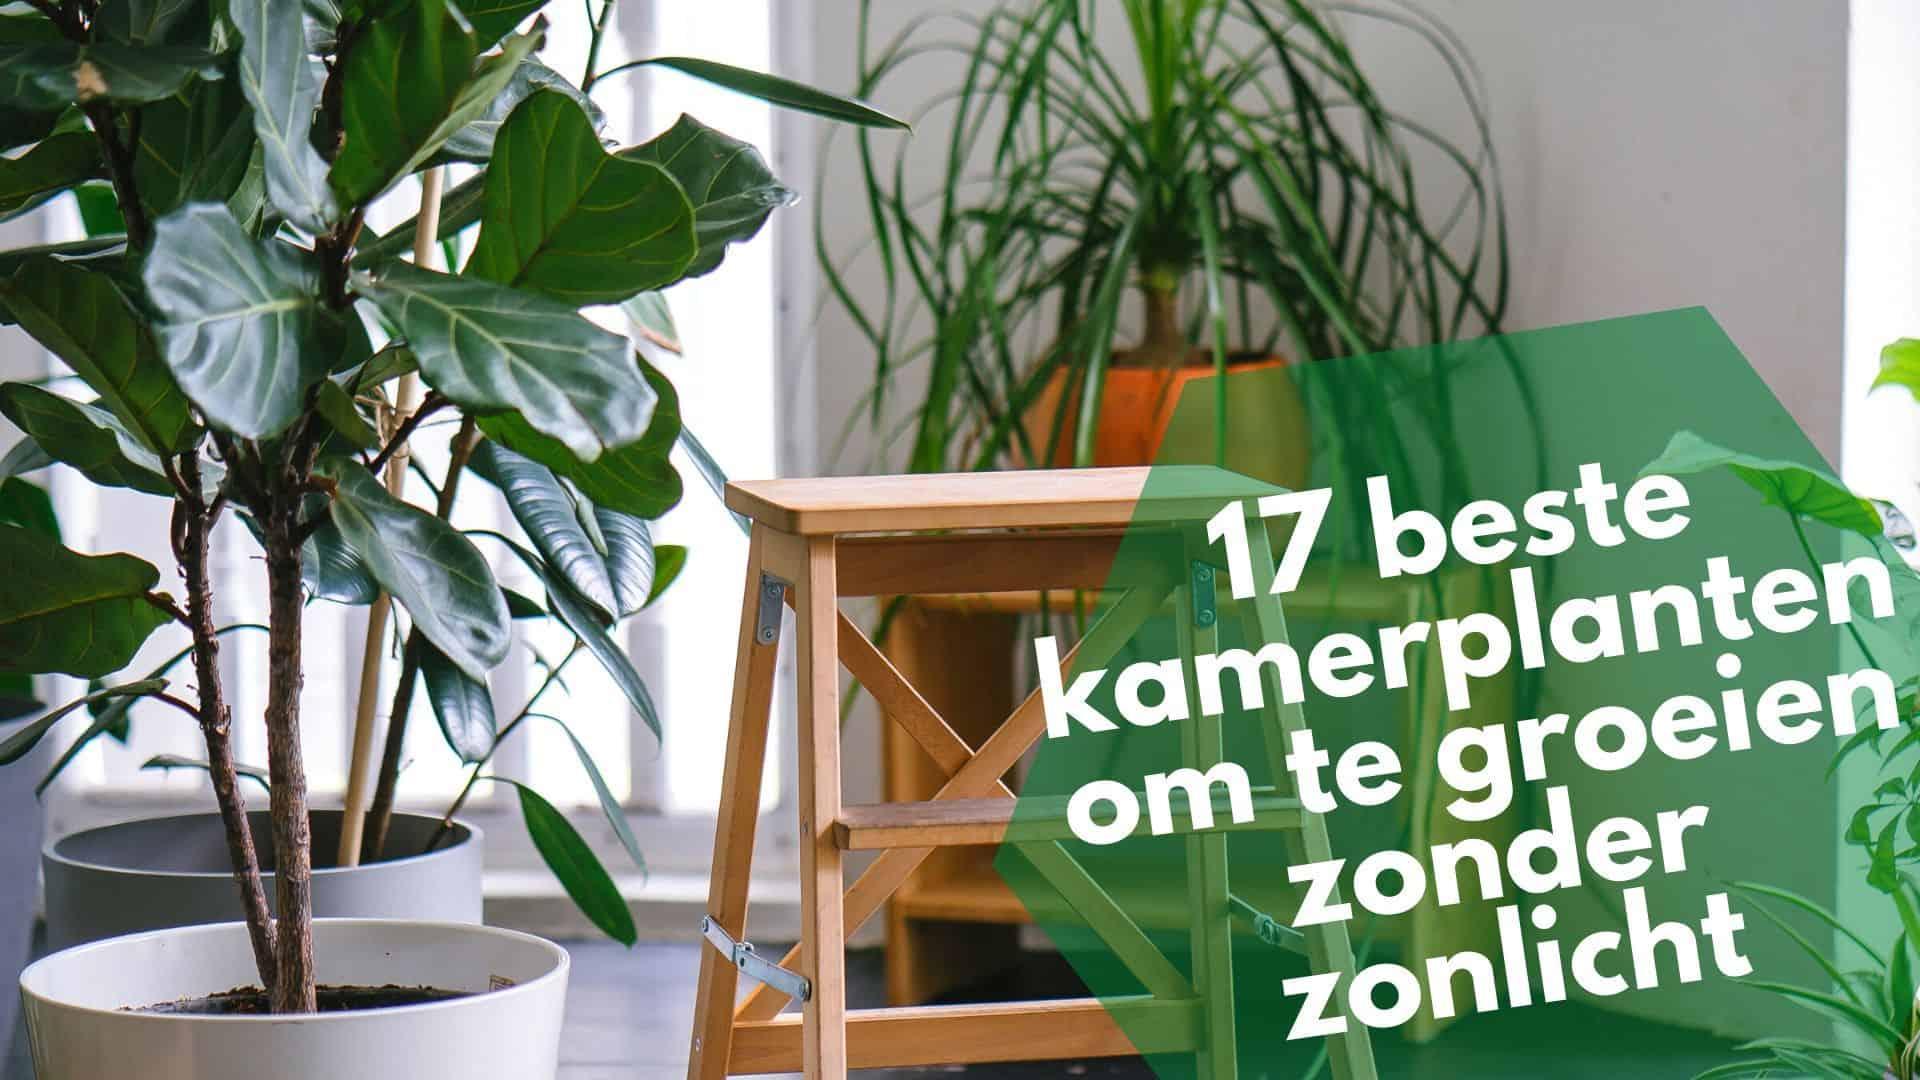 De 17 beste kamerplanten die groeien zonder zonlicht